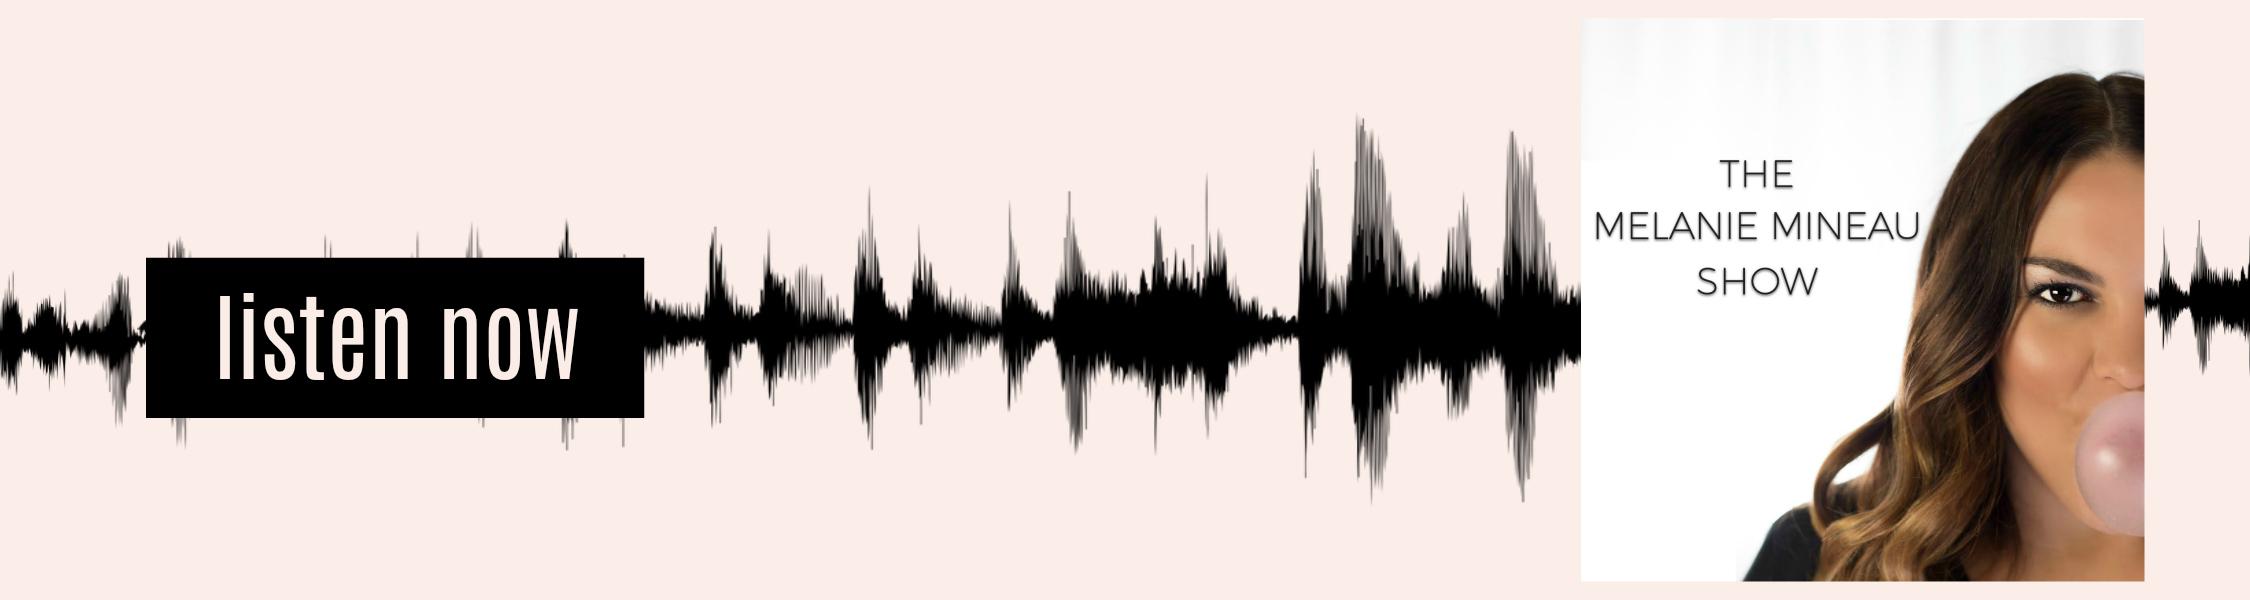 Listen Now Podcast Banner- Melanie Mineau.jpg